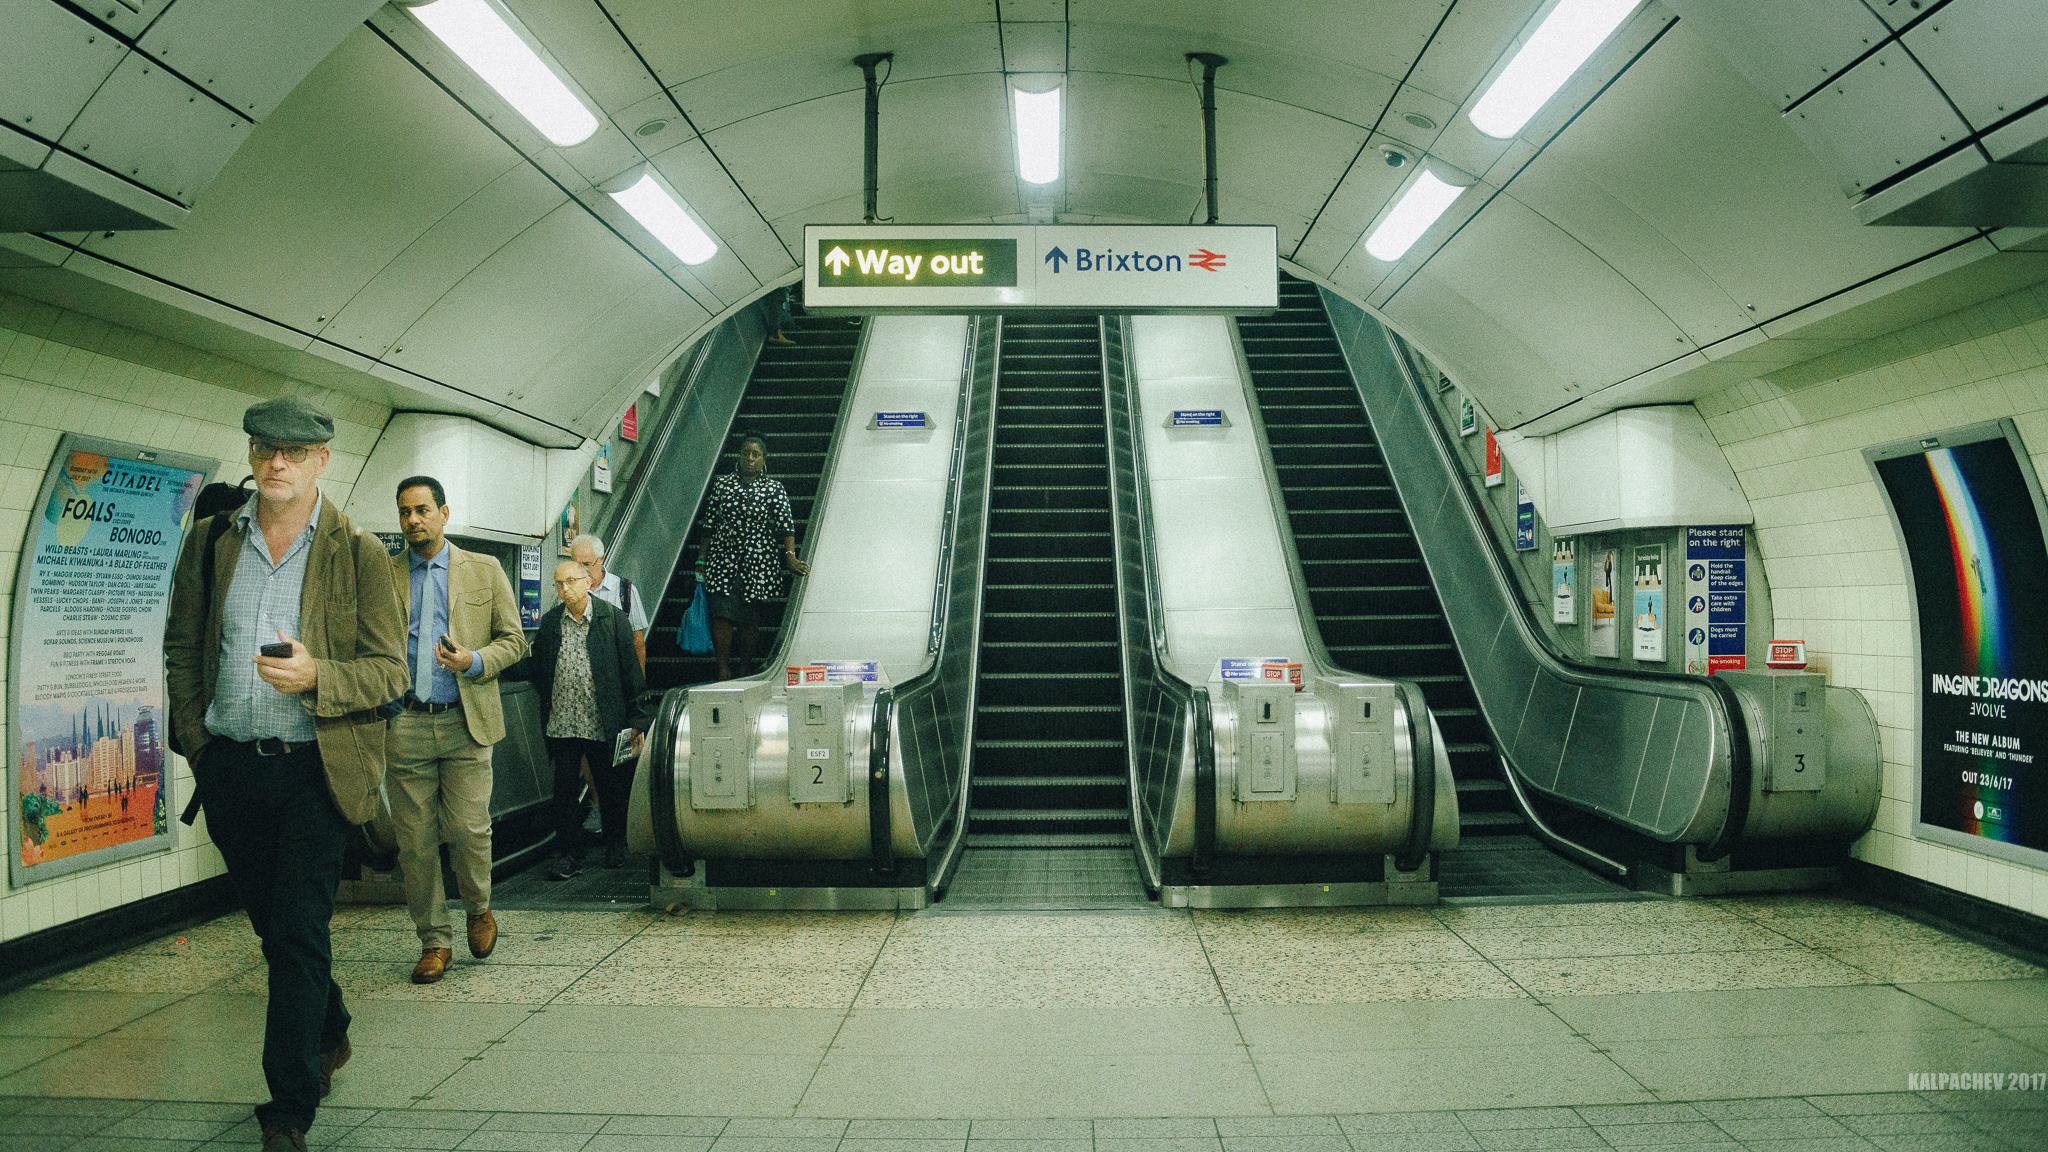 Walk in London with Sony A7R II + Vivitar 28mm F2/.8